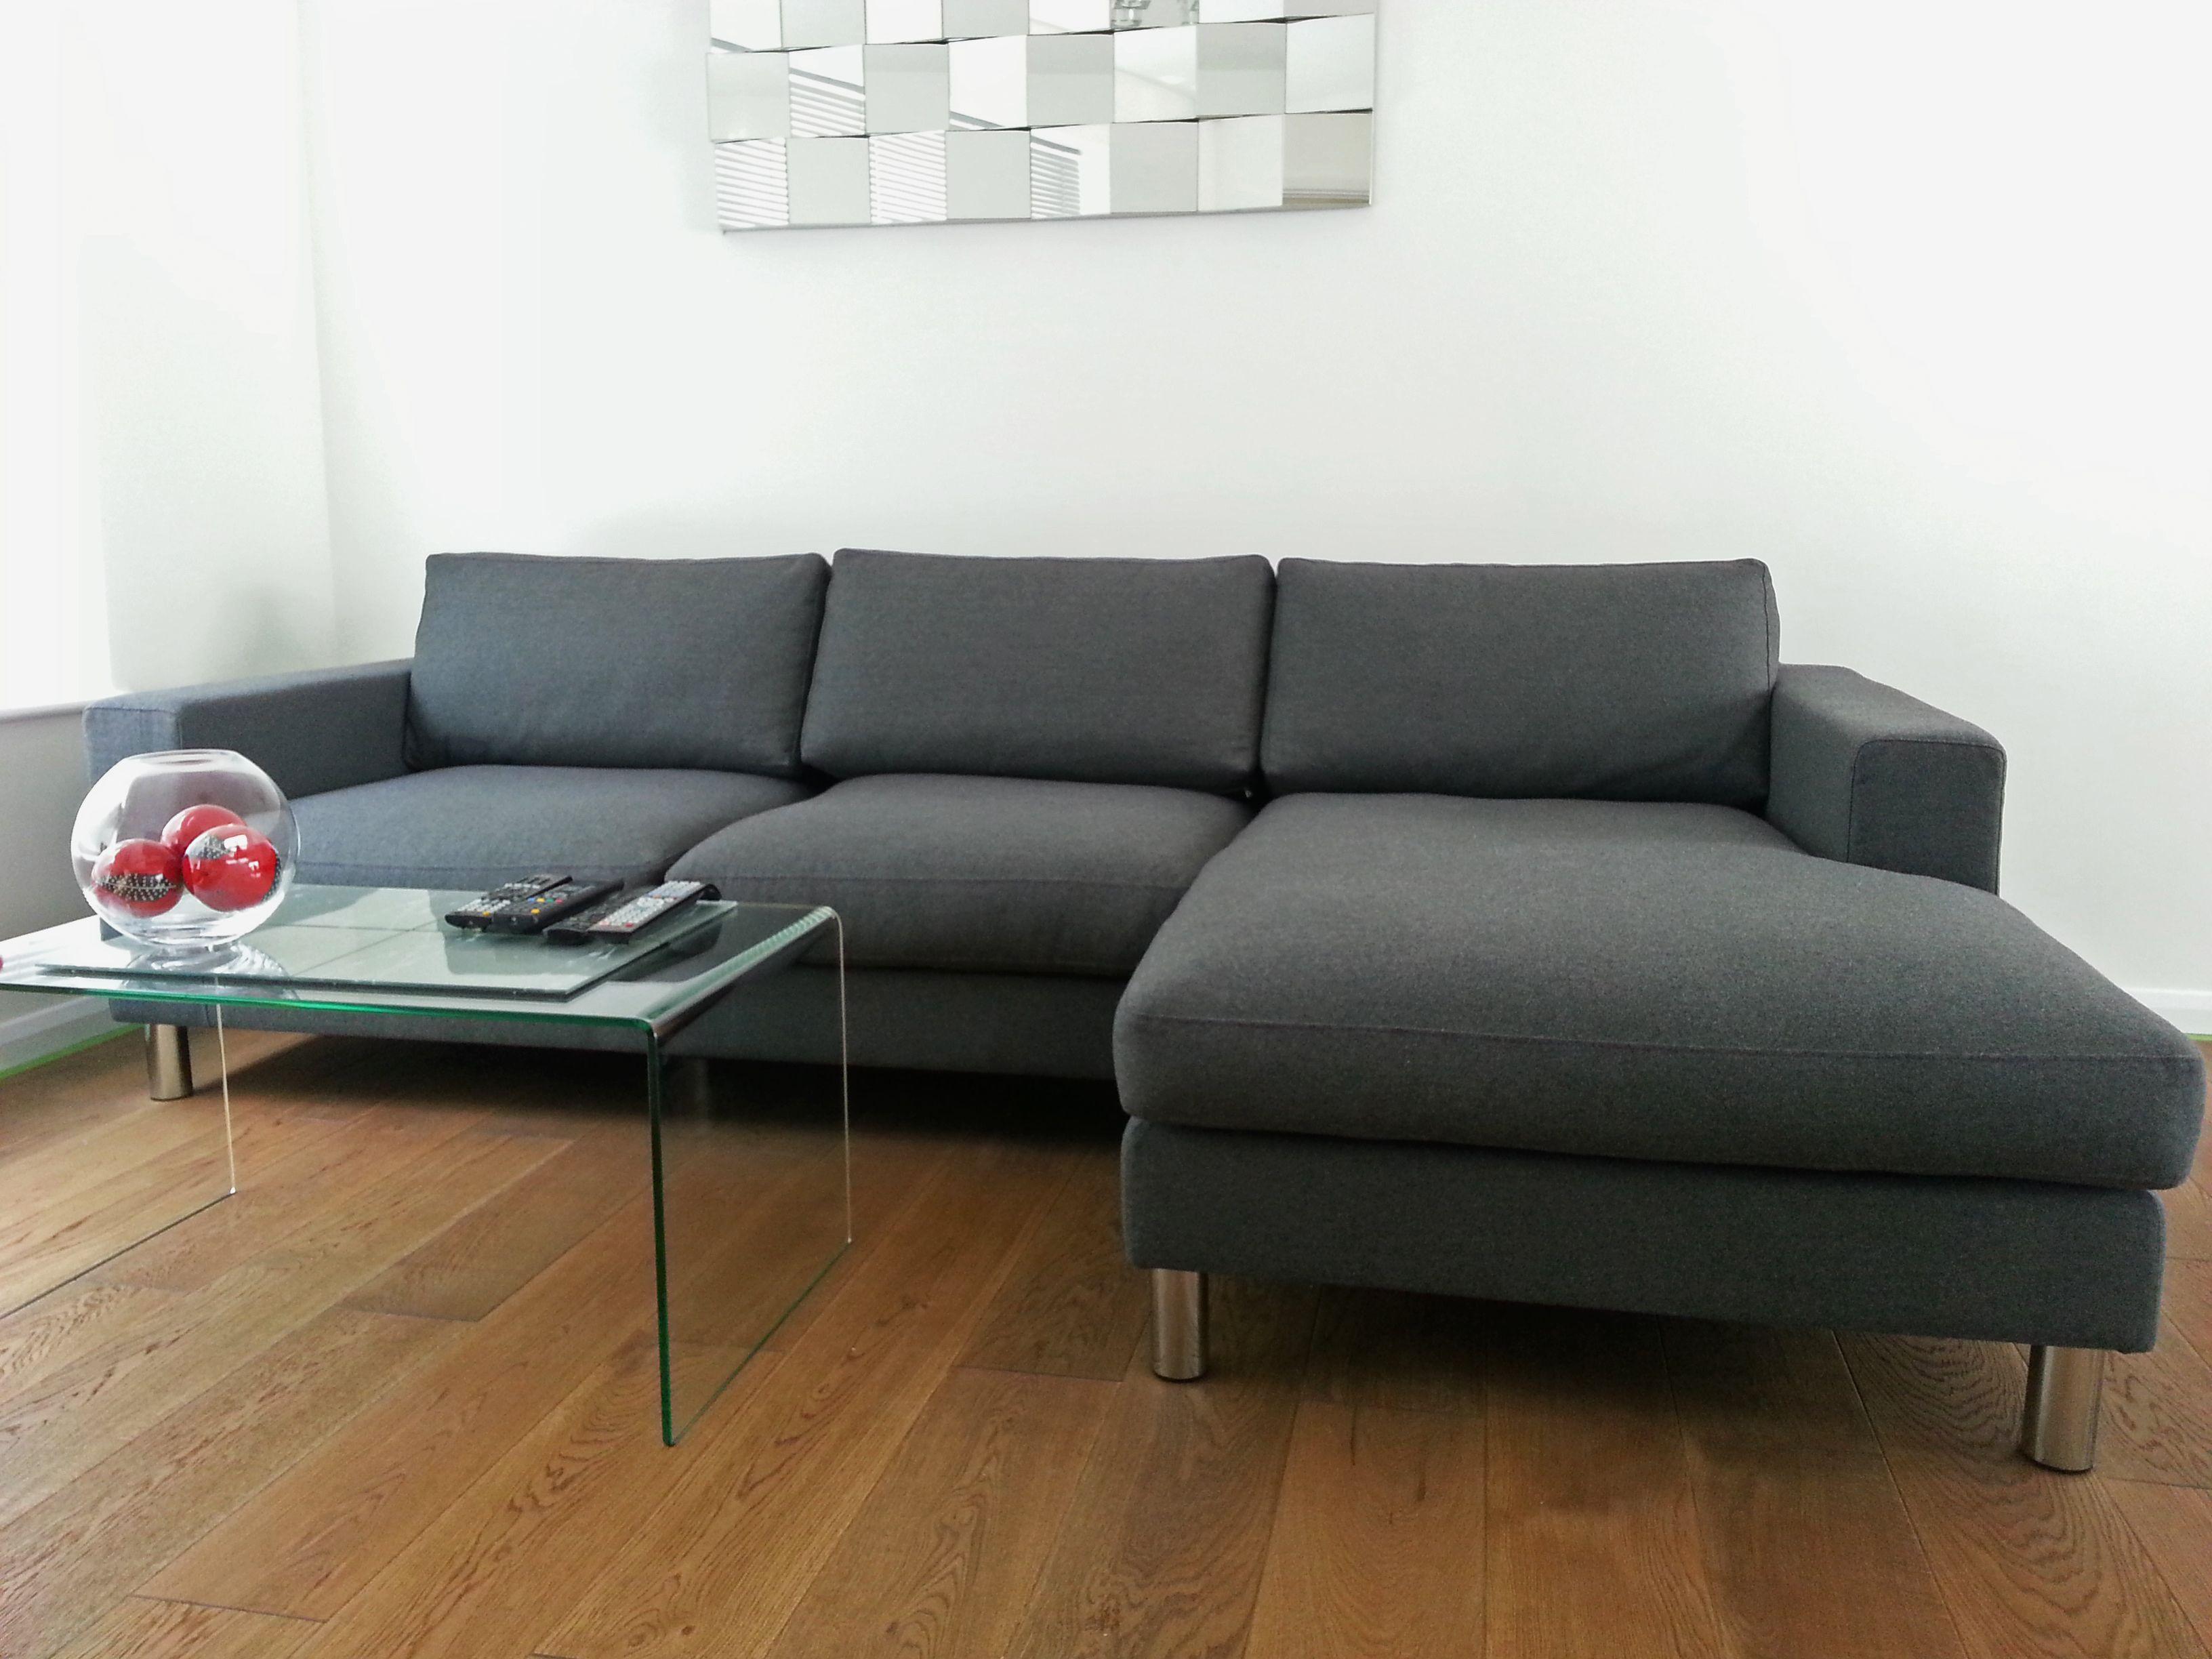 Biki Modern Corner Sofa sent by Aggy From Bristol You can